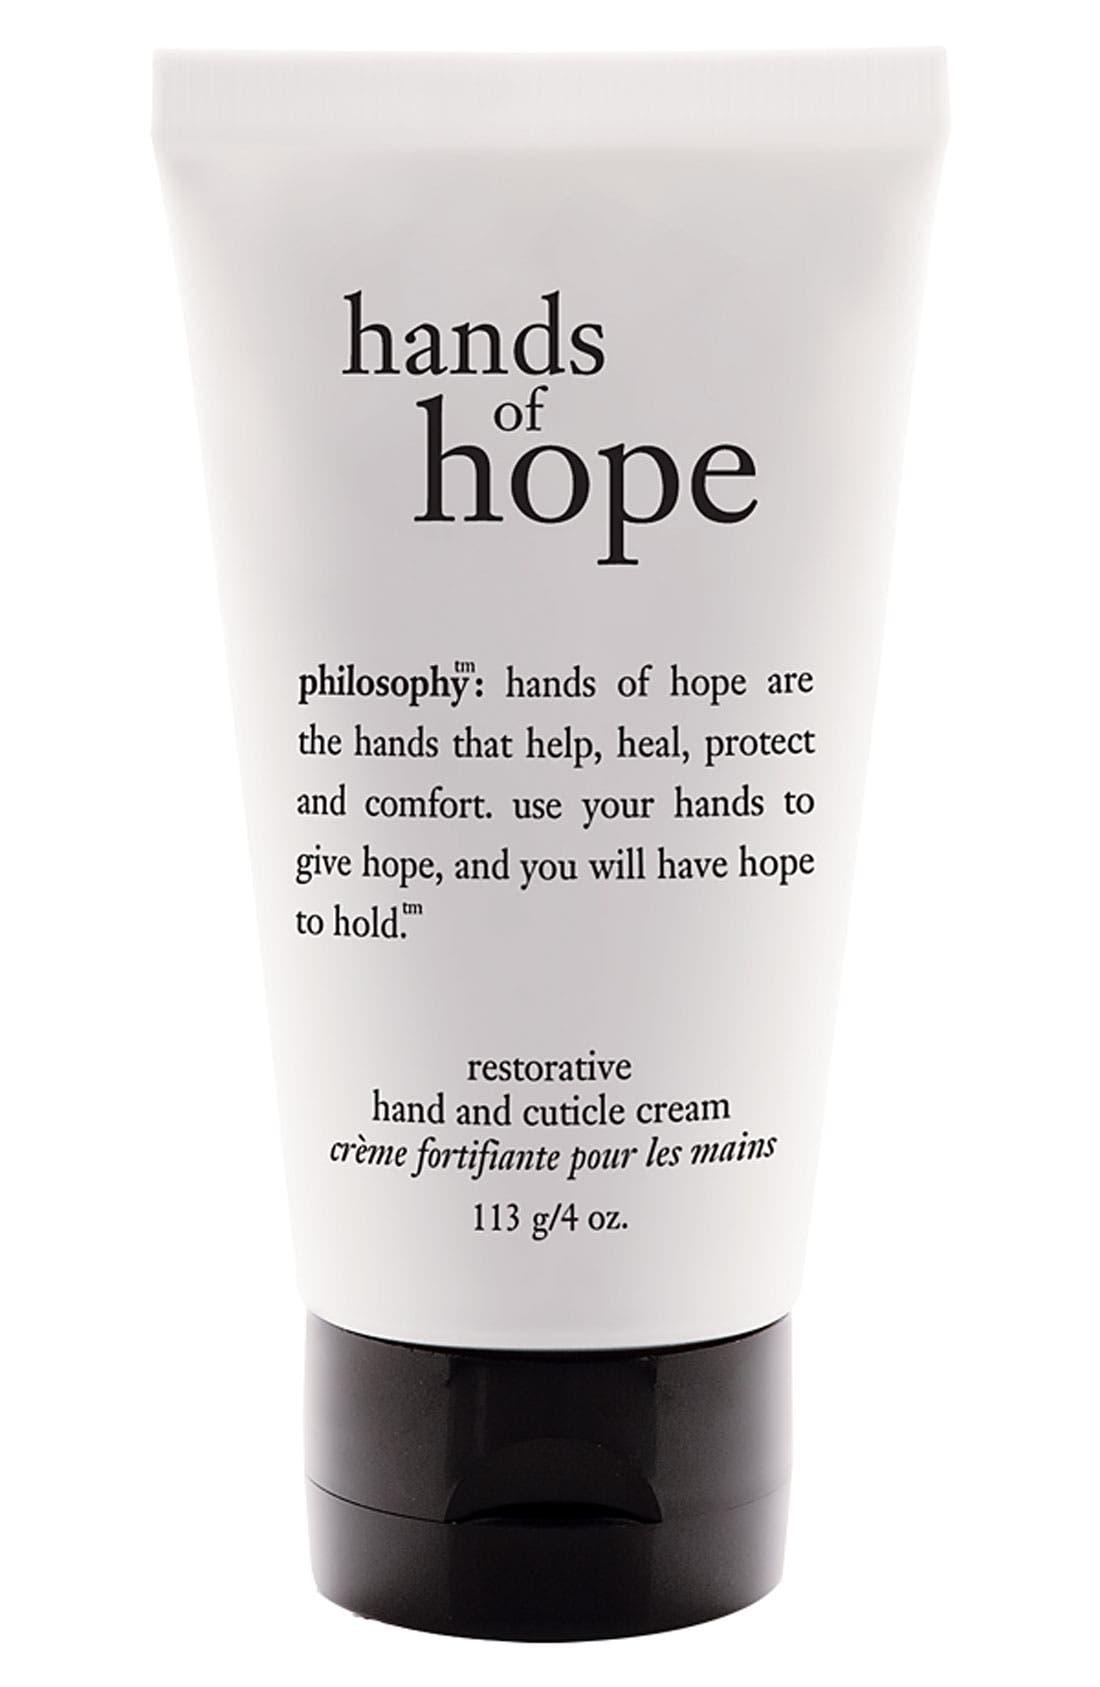 philosophy 'hands of hope' hand & cuticle cream